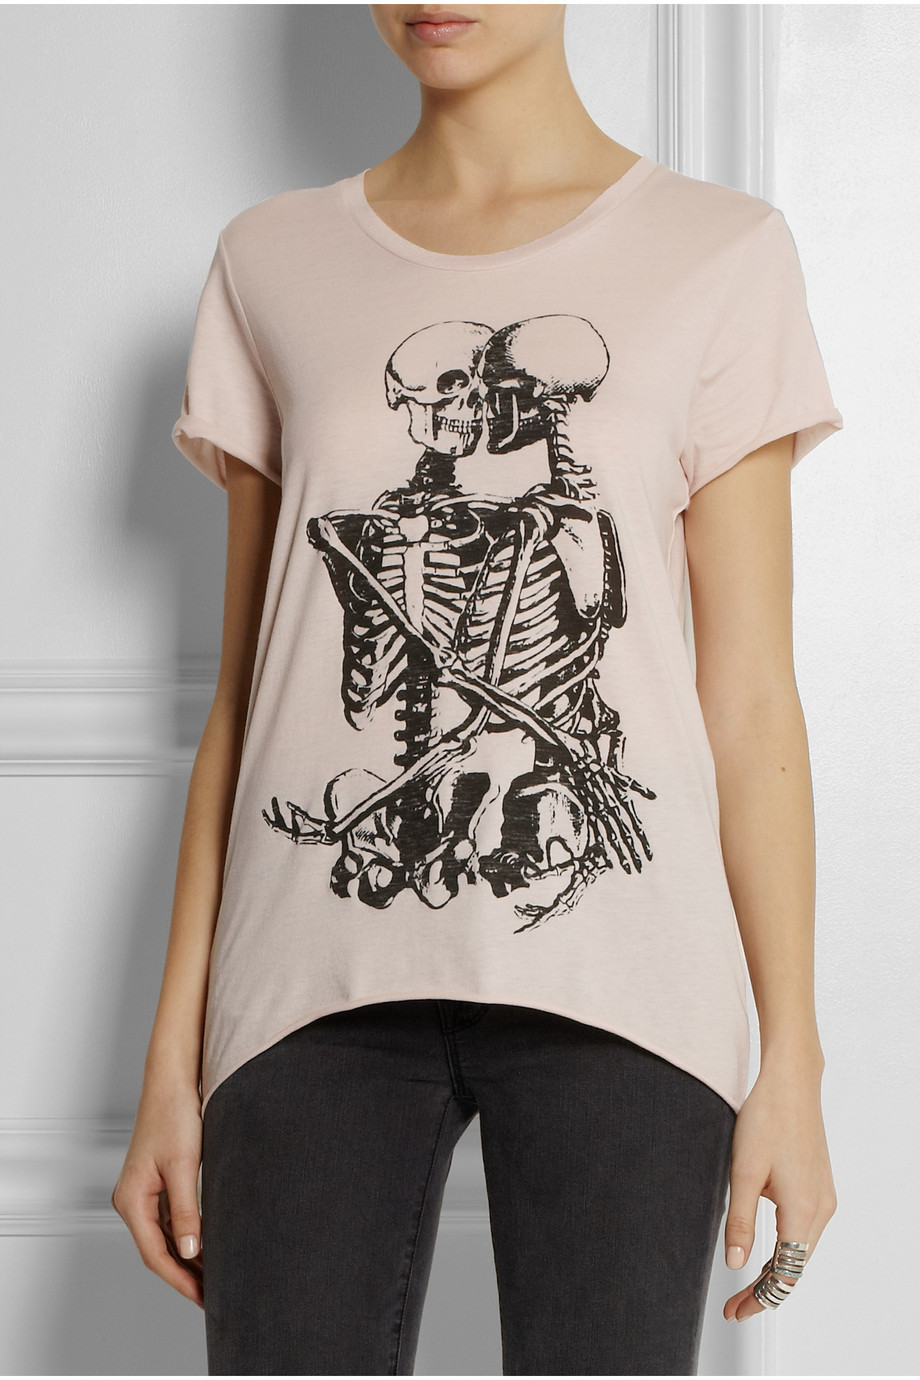 Zoe Karssen Skull Lovers Cotton-Blend Jersey T-Shirt | Fancy Friday - The Cost of Comfort - Cute Loungewear